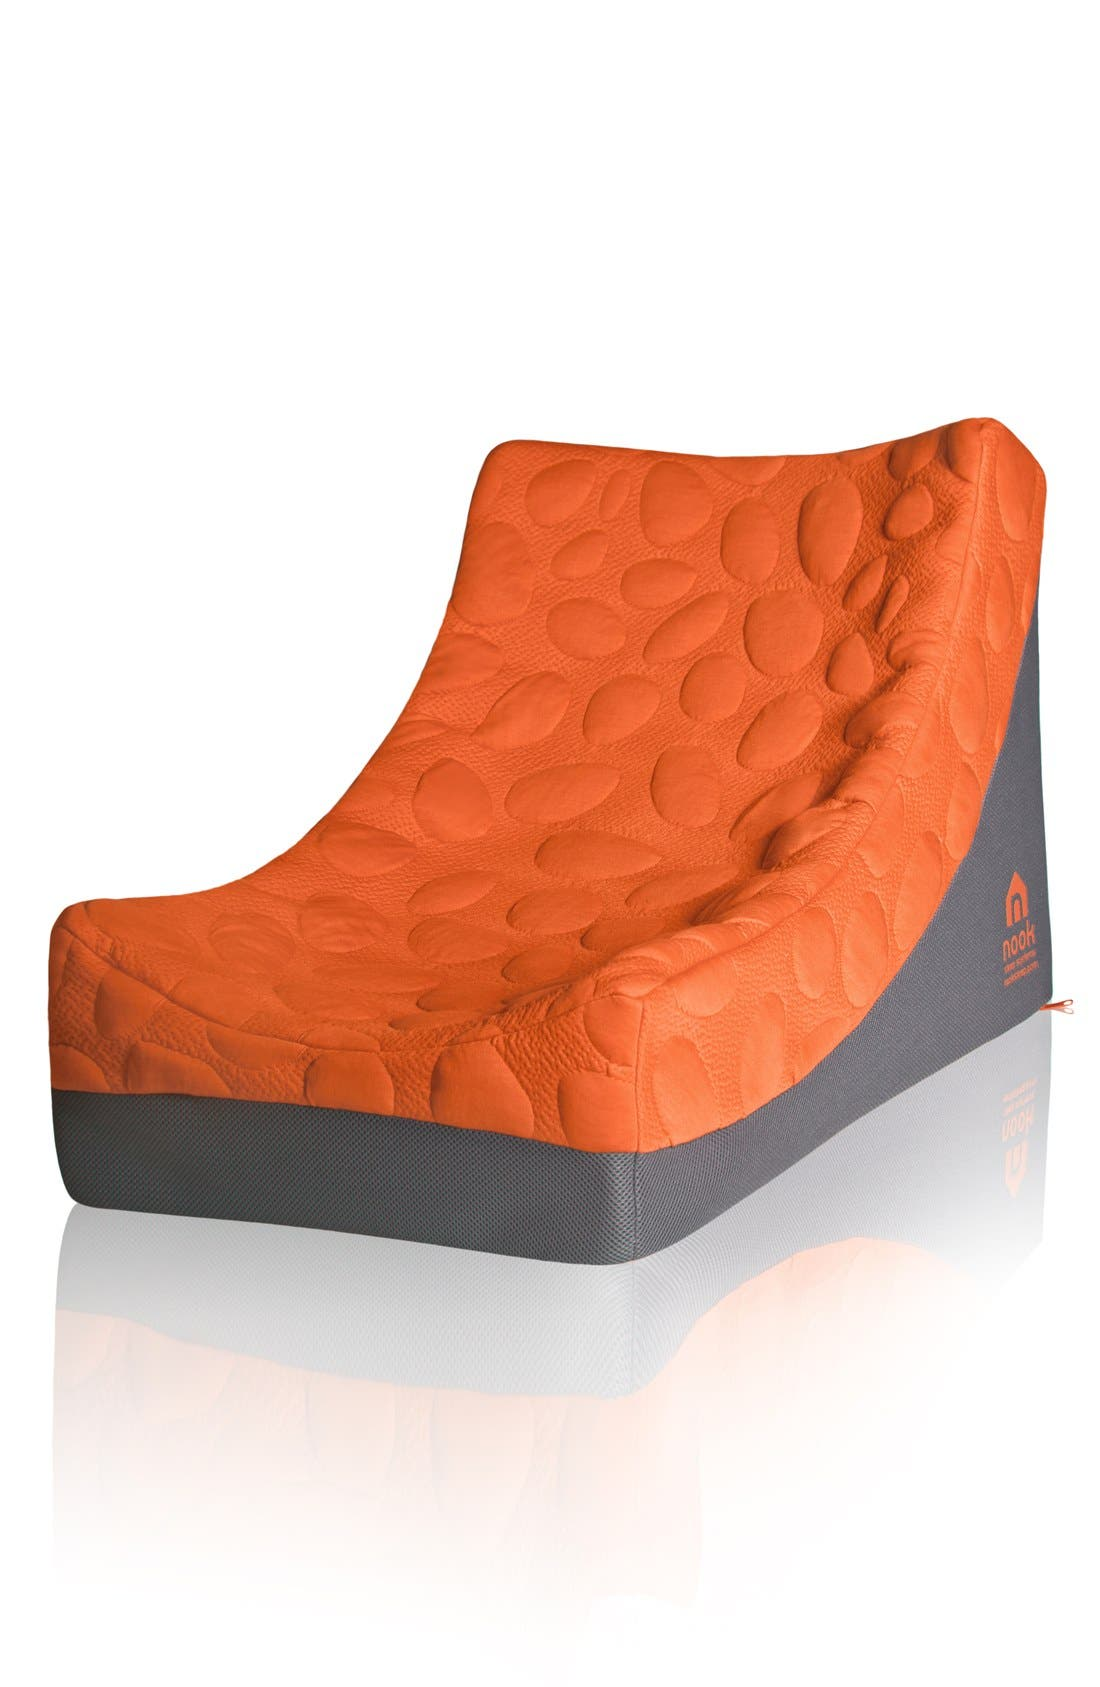 Infant Nook Sleep Systems Pebble Lounger Size One Size  Orange